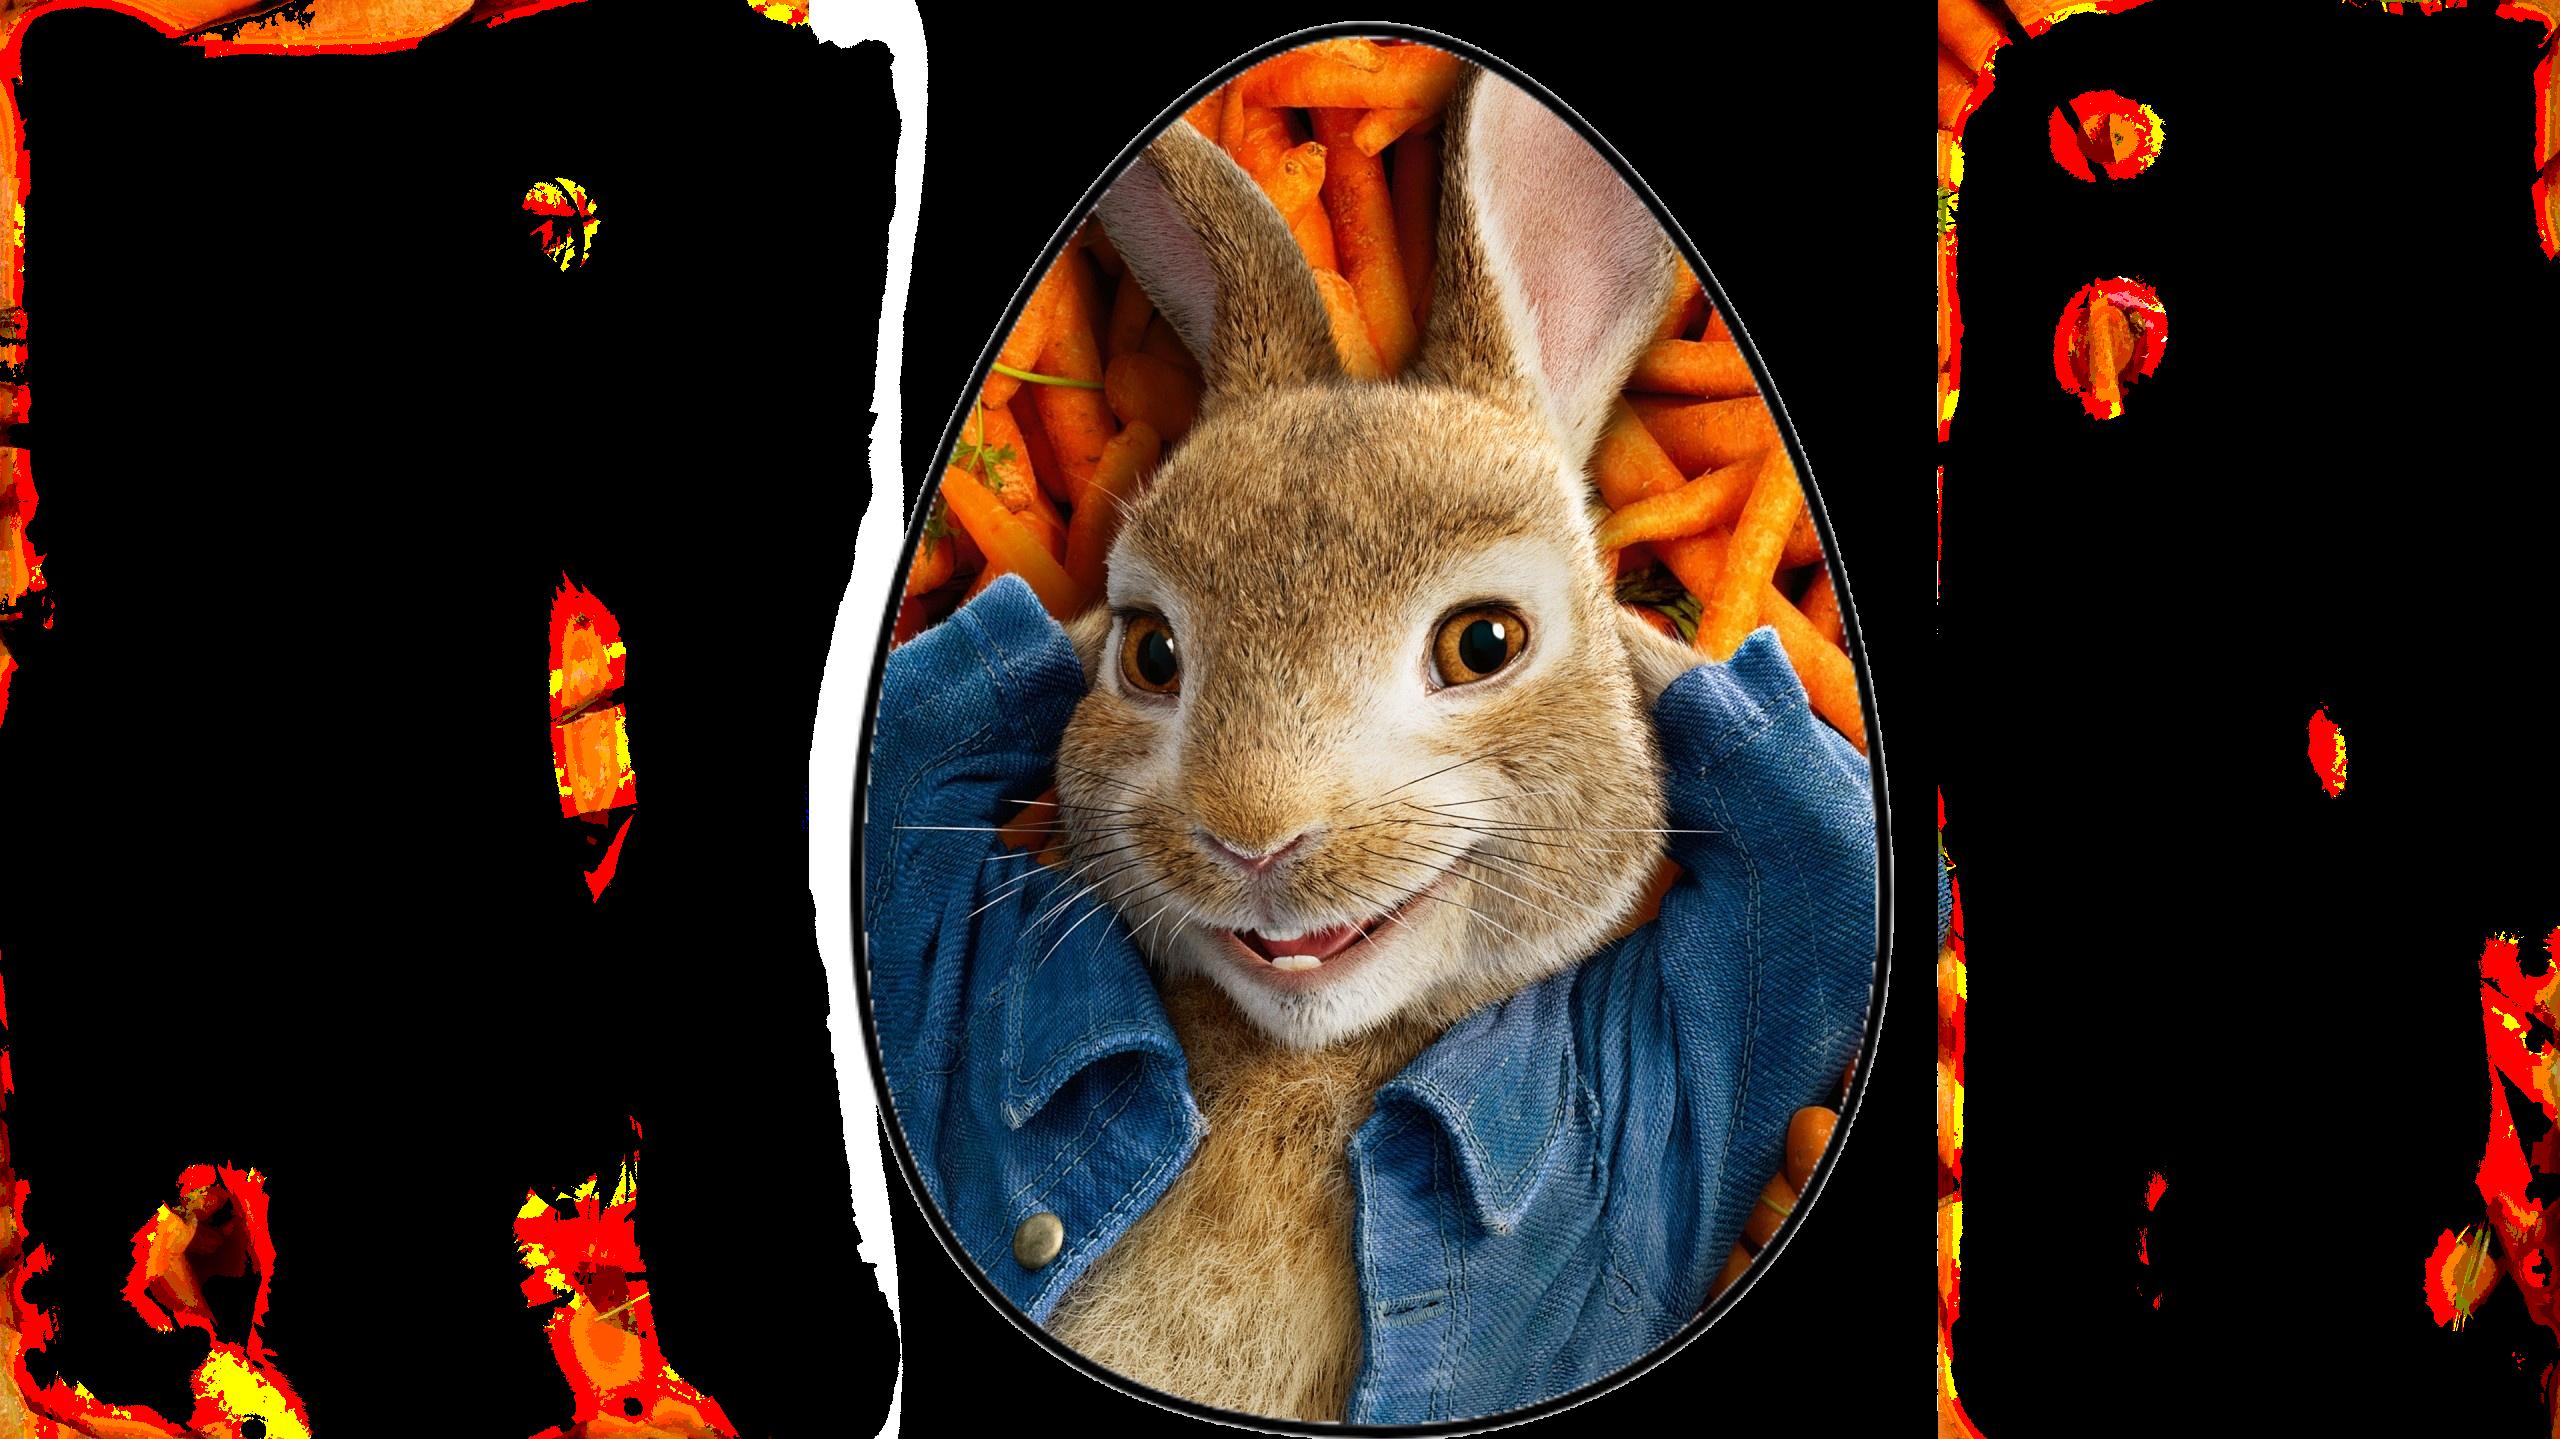 wallpapersdencom_peter-rabbit-2018-movie-poster_2560x1600 (1).png